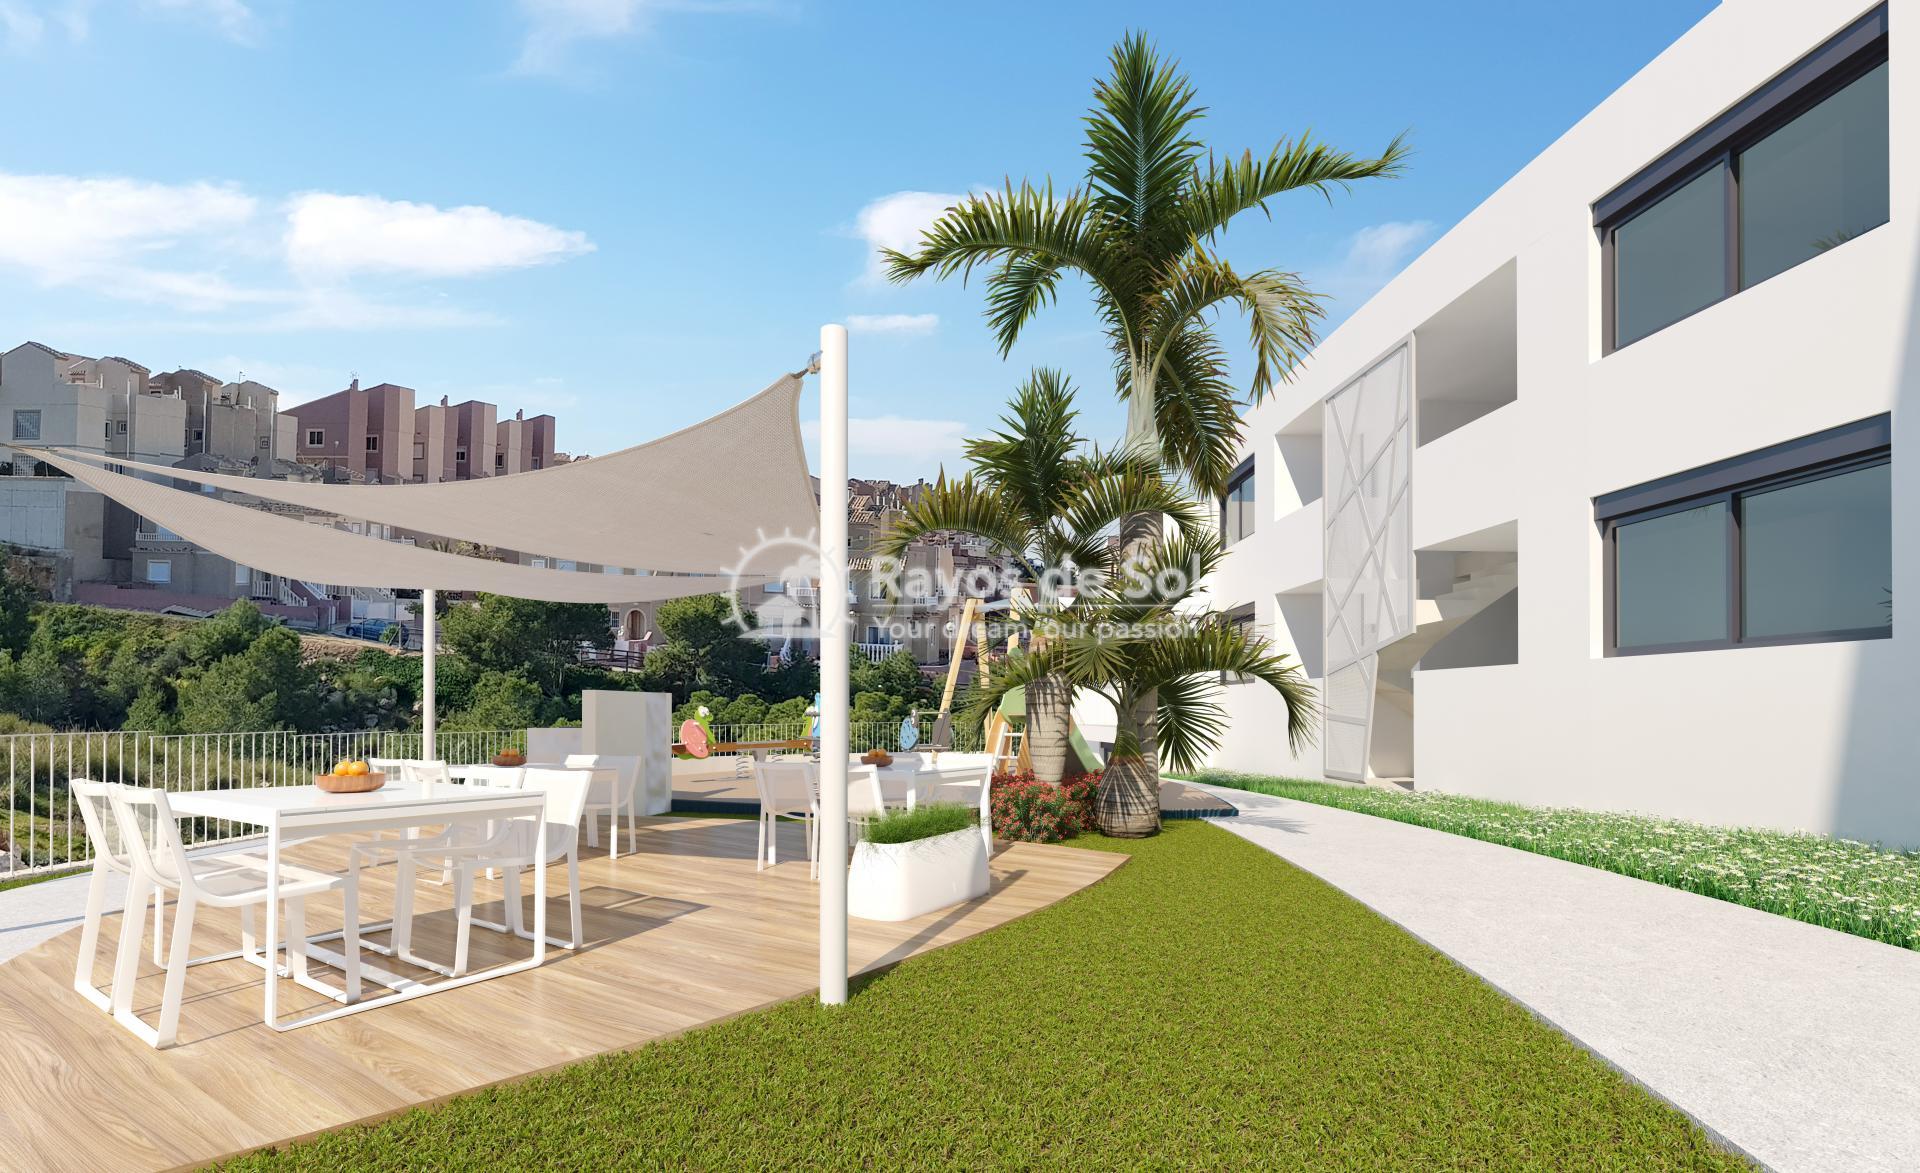 Apartment with seaviews  in Santa Pola, Costa Blanca (Aura apt2d) - 7